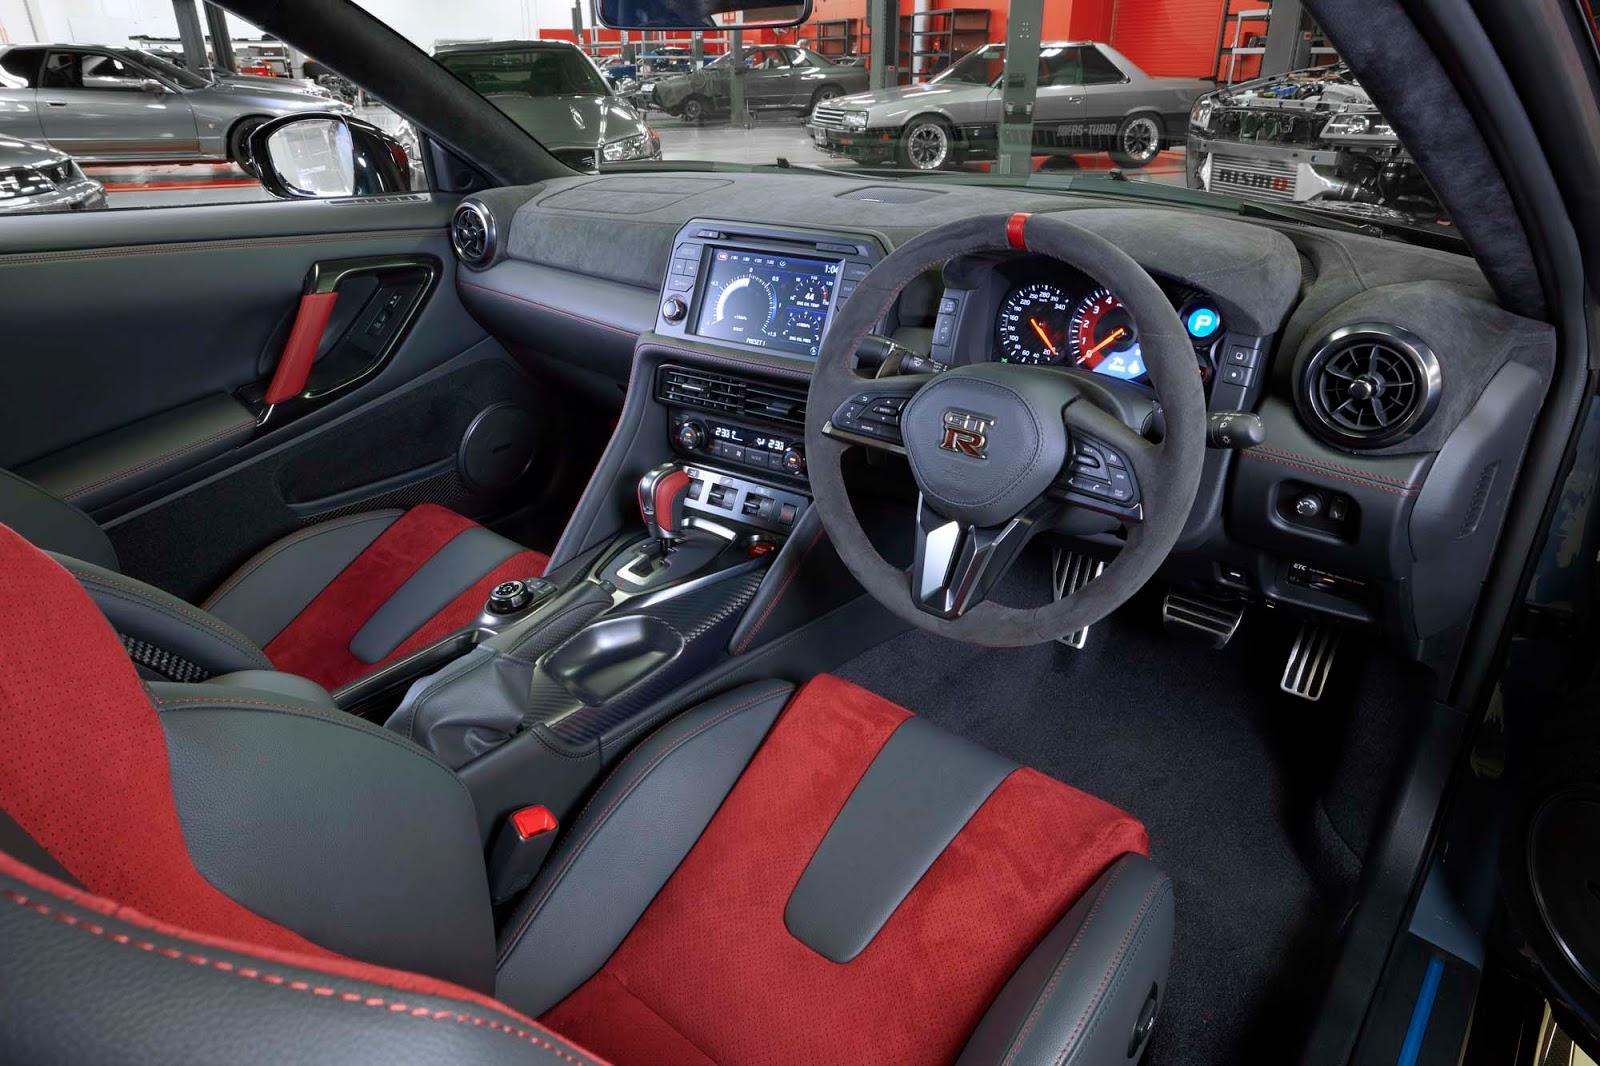 210408 New GT R NISMO 3930 1